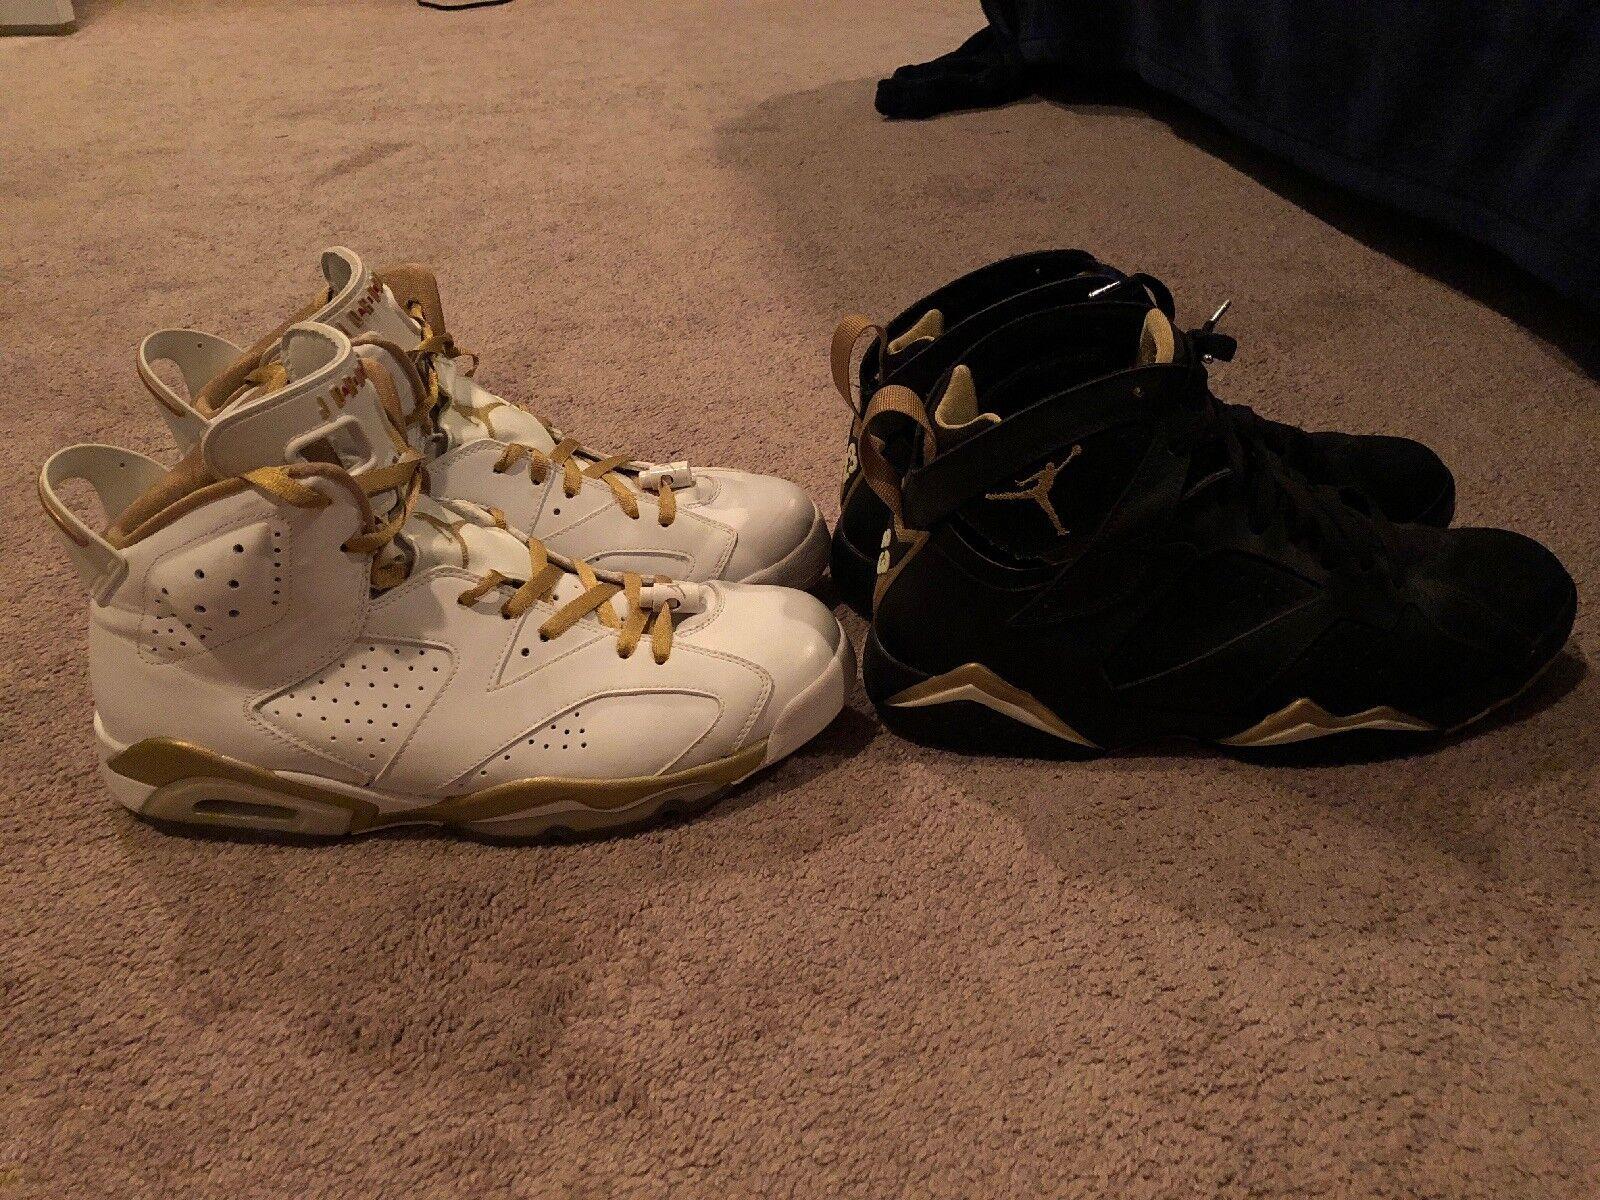 Air Jordan Retro VI and VII, golden Moments size 12